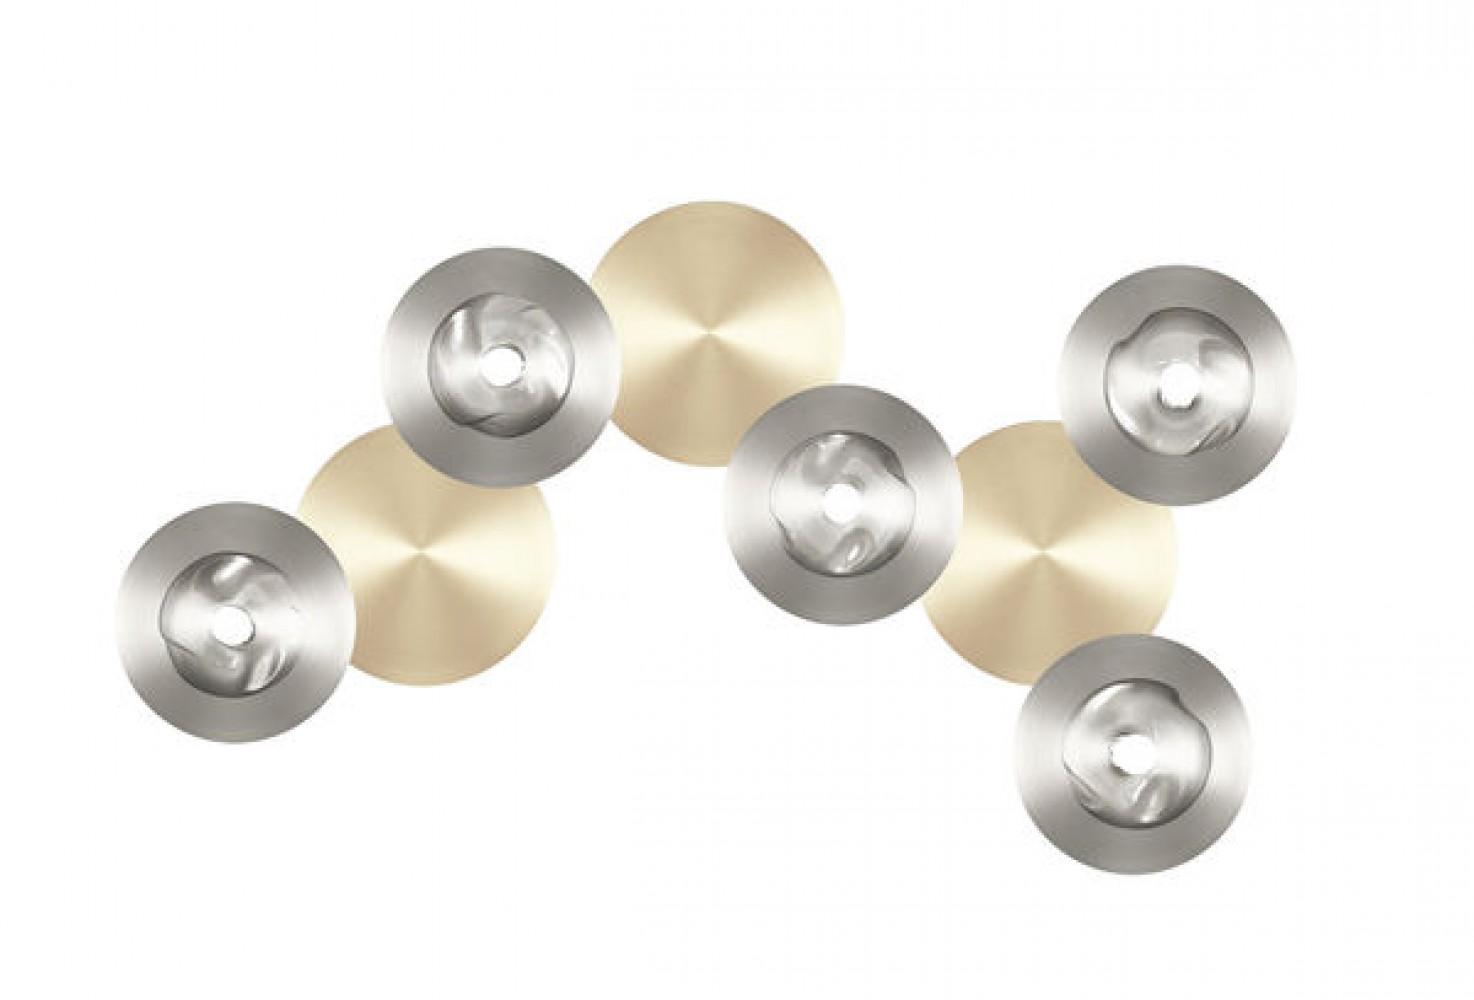 Applique / Plafonnier Dots B nickel - satiné 5L